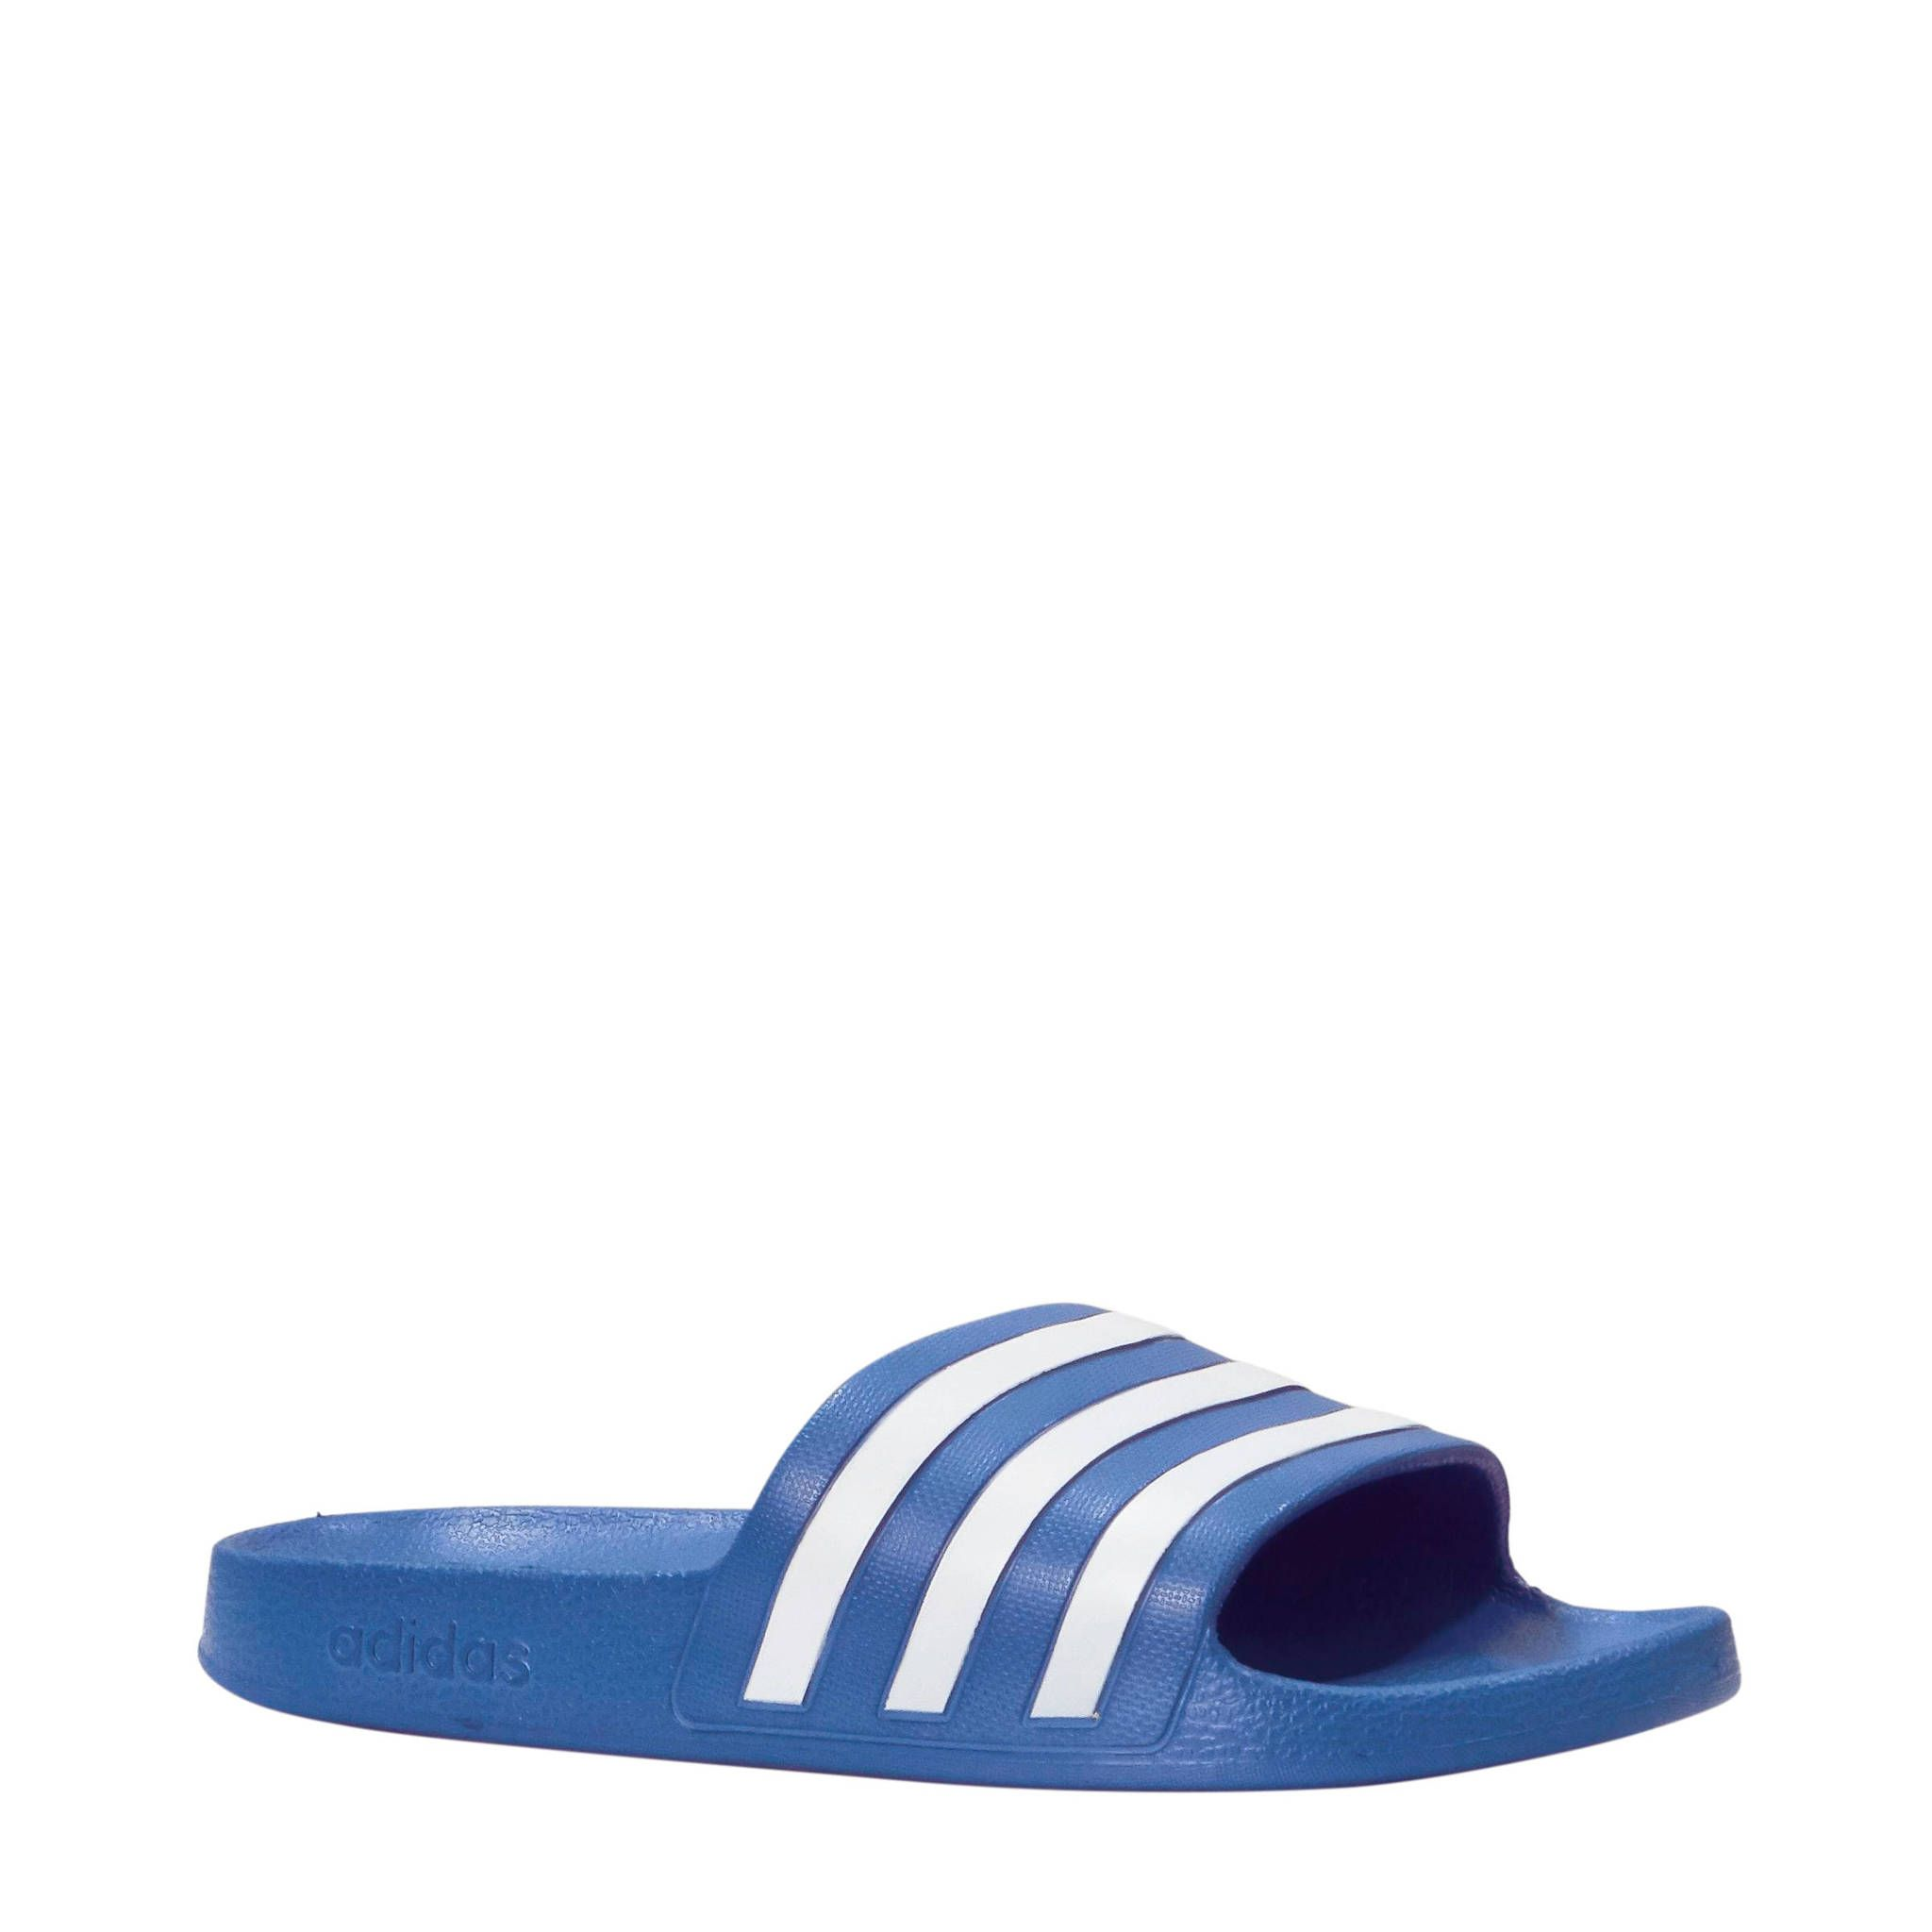 Adilette Aqua badslippers aqua/wit - Adidas, Aqua en Slippers